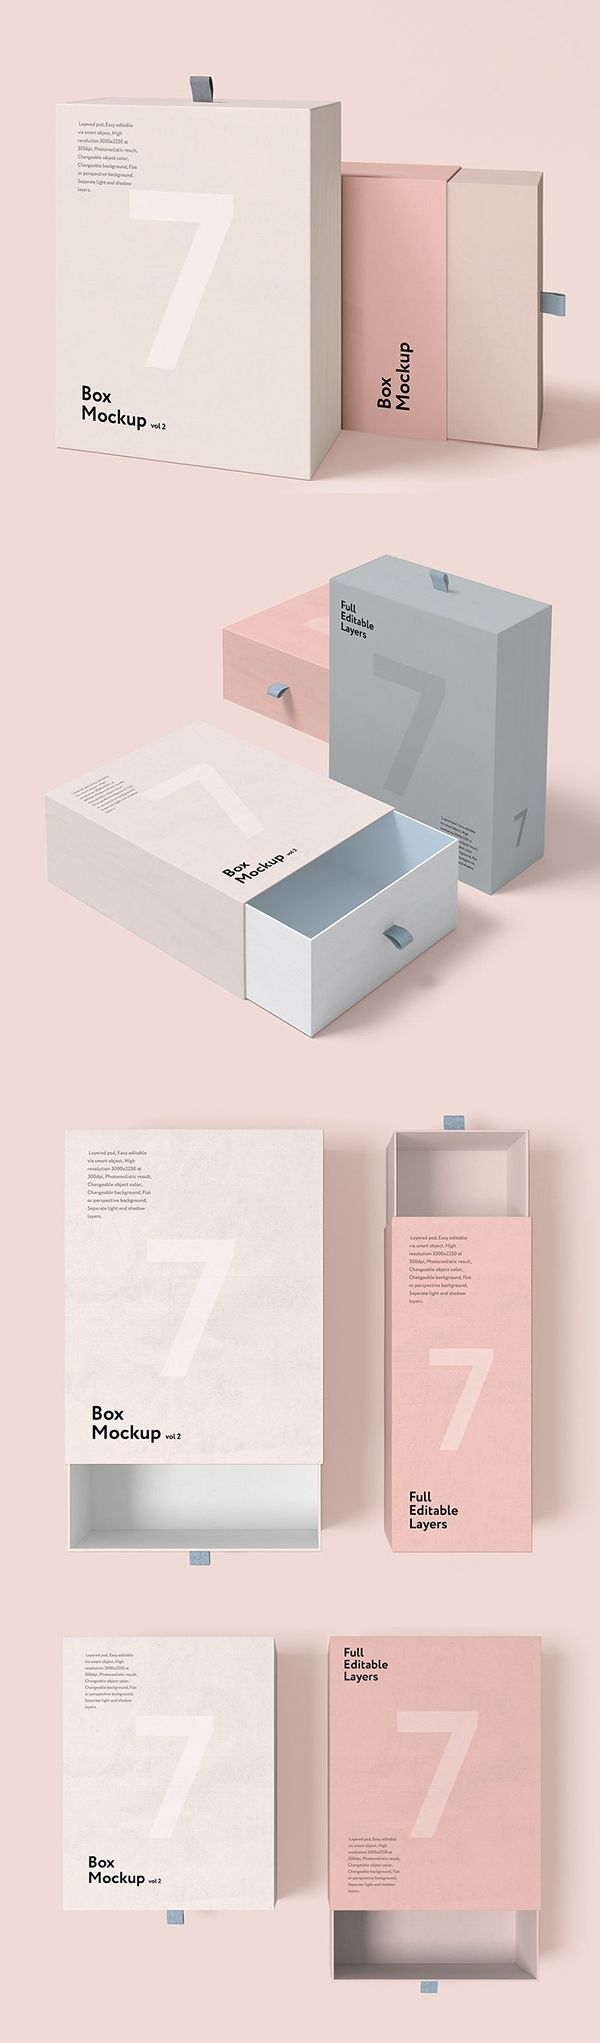 32 Product Mockup Templates Download Realistic Psd Mockups Design Graphic Design Junction Branding Design Packaging Creative Packaging Design Box Packaging Design